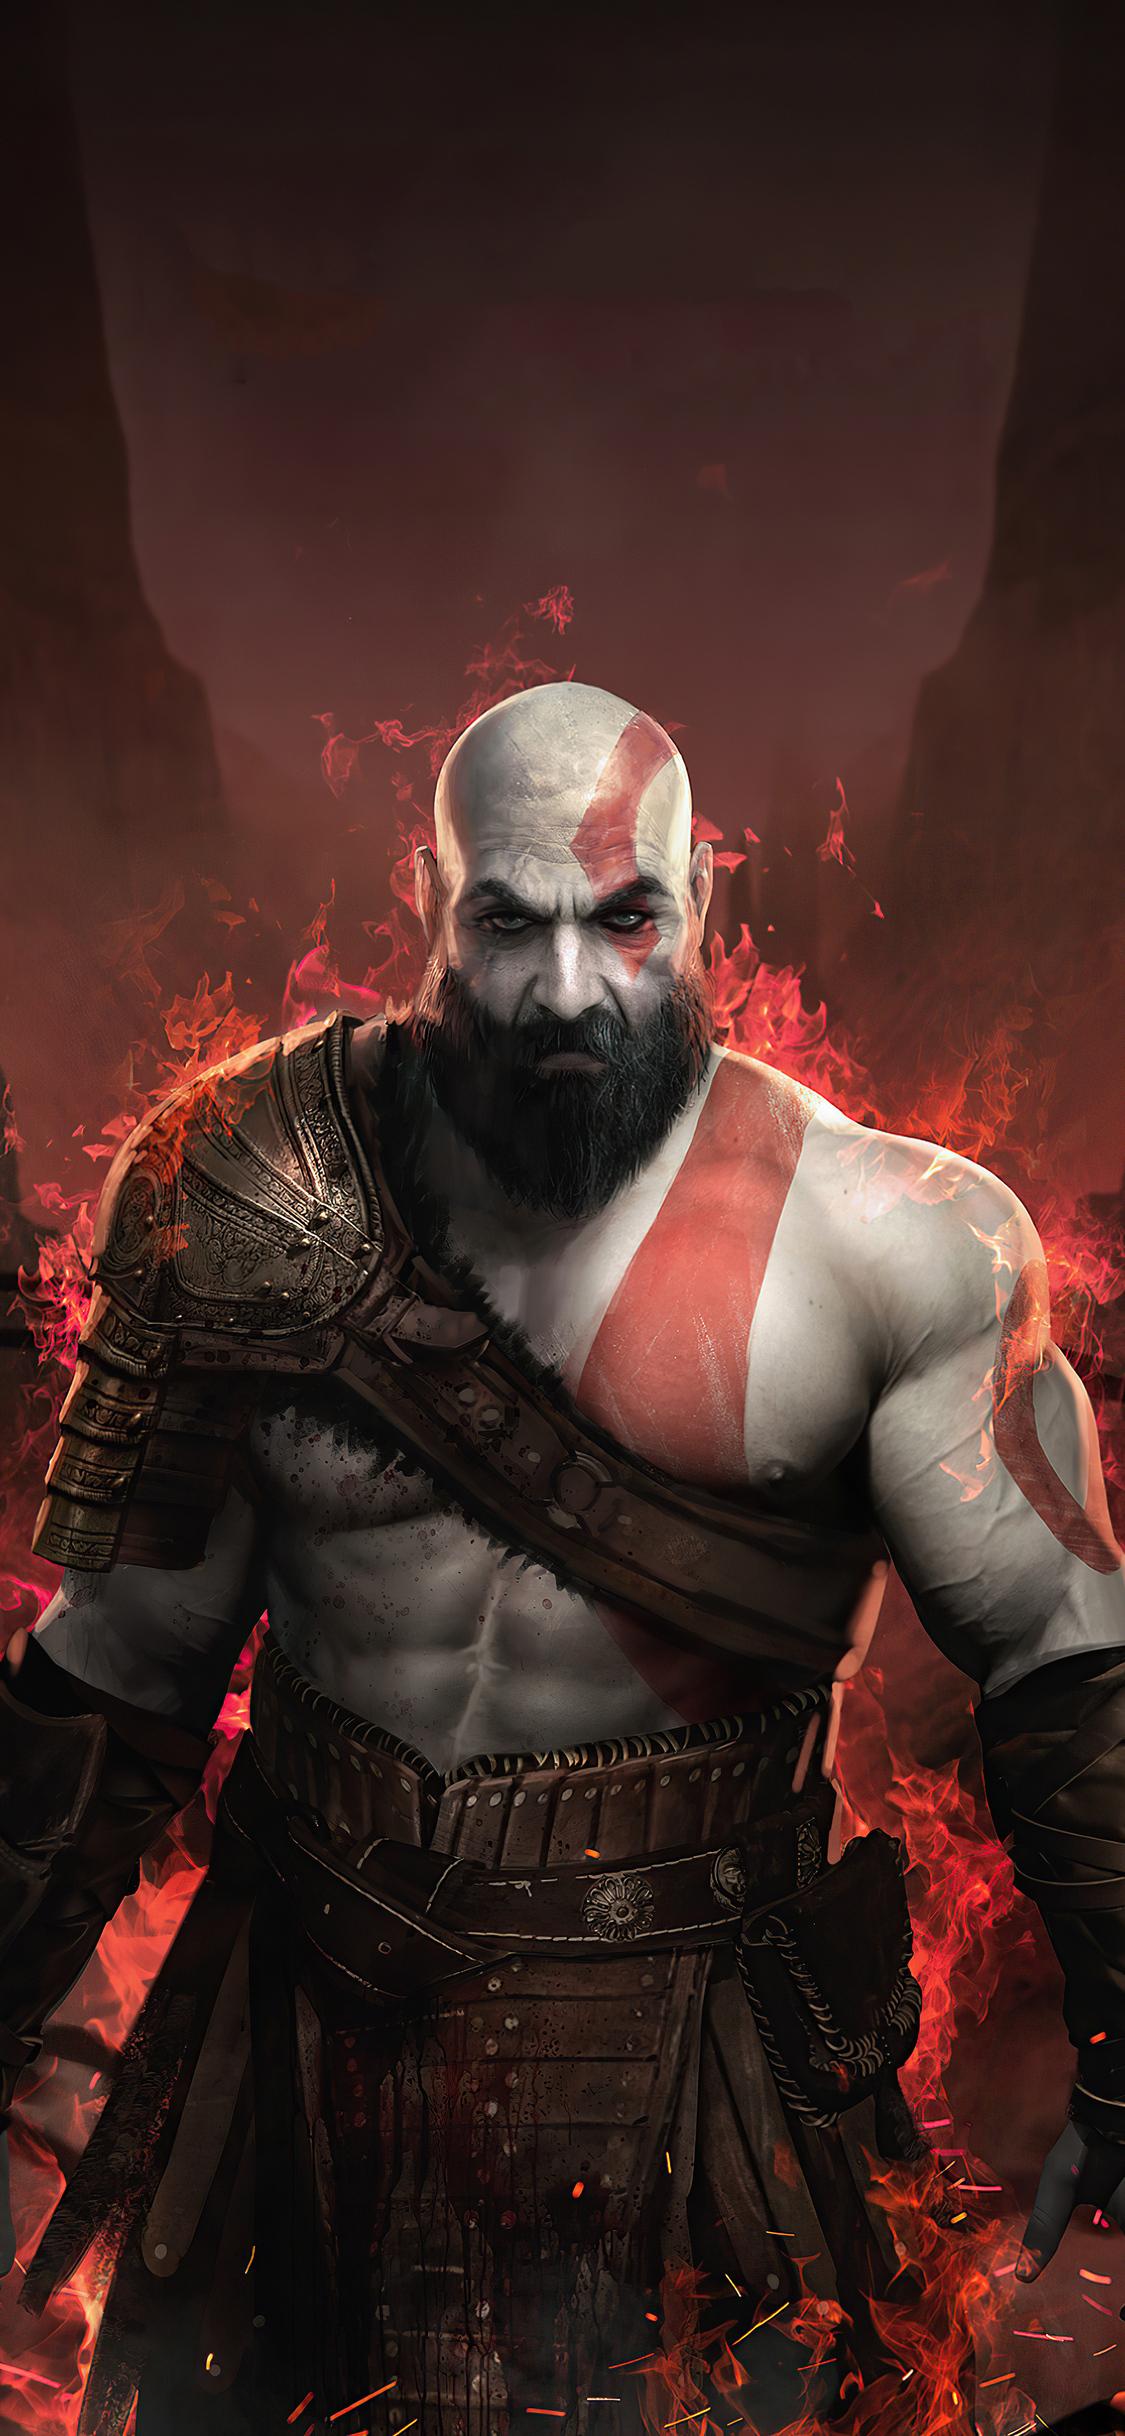 kratos-god-of-war-4-2020-4k-2w.jpg